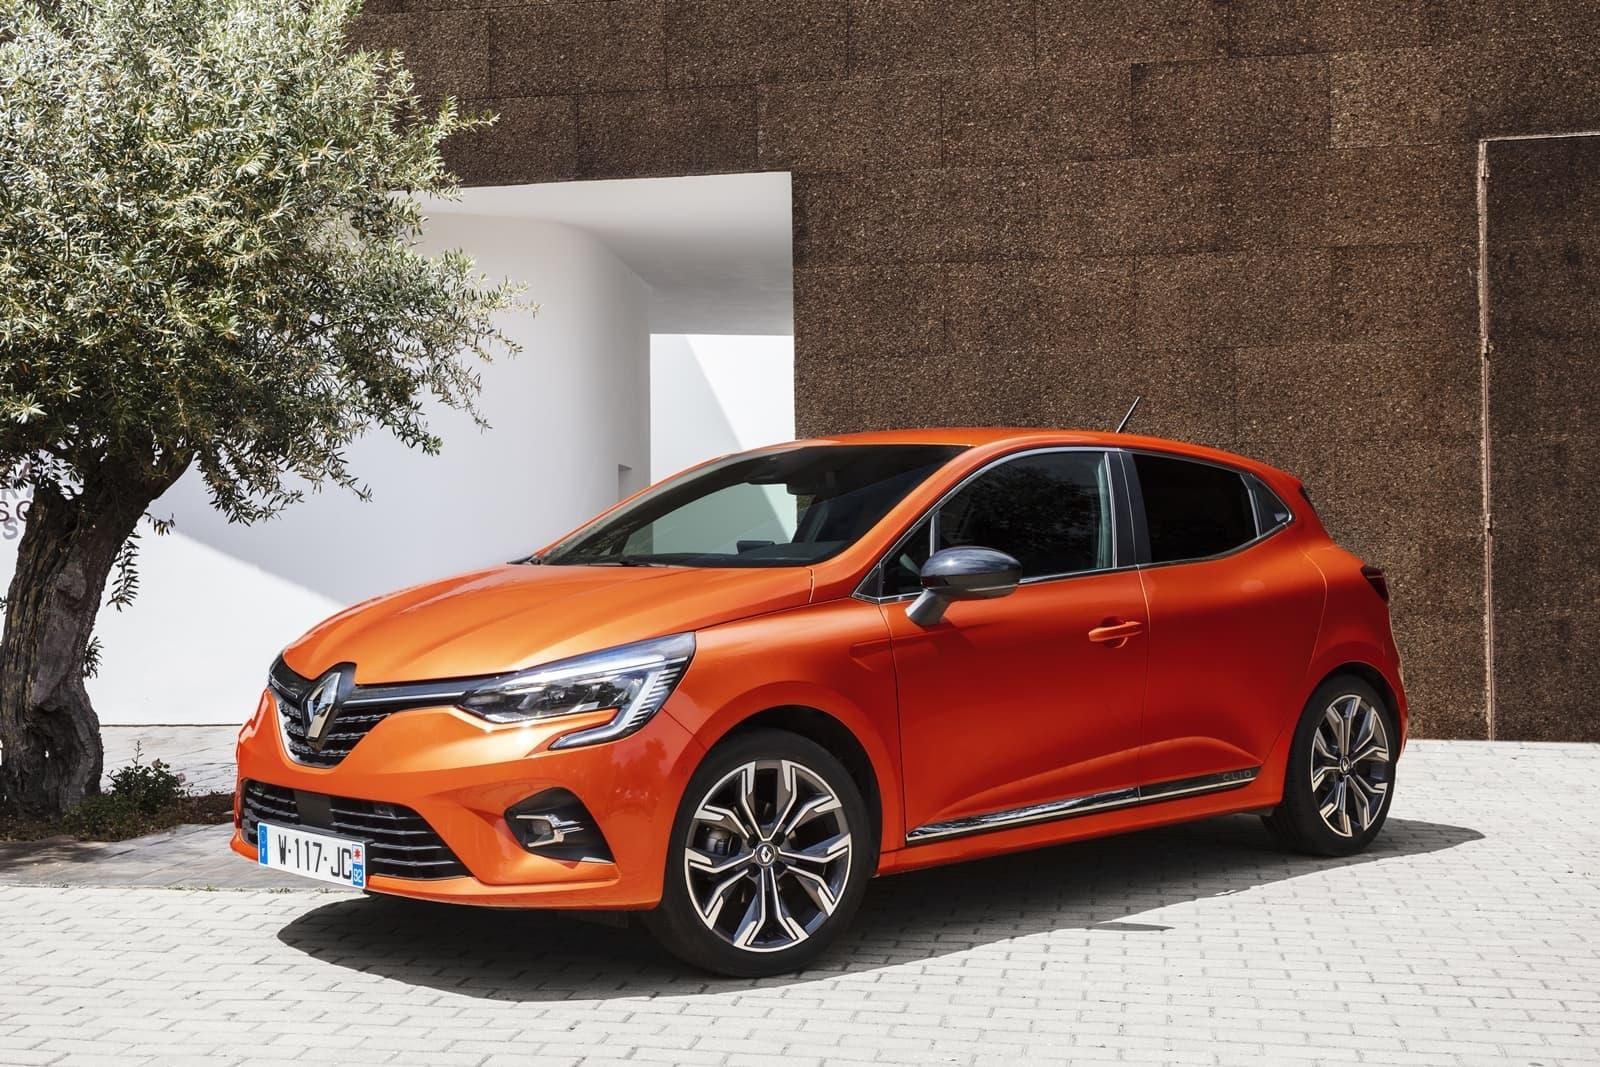 Renault Clio 2020 Prueba 0619 014